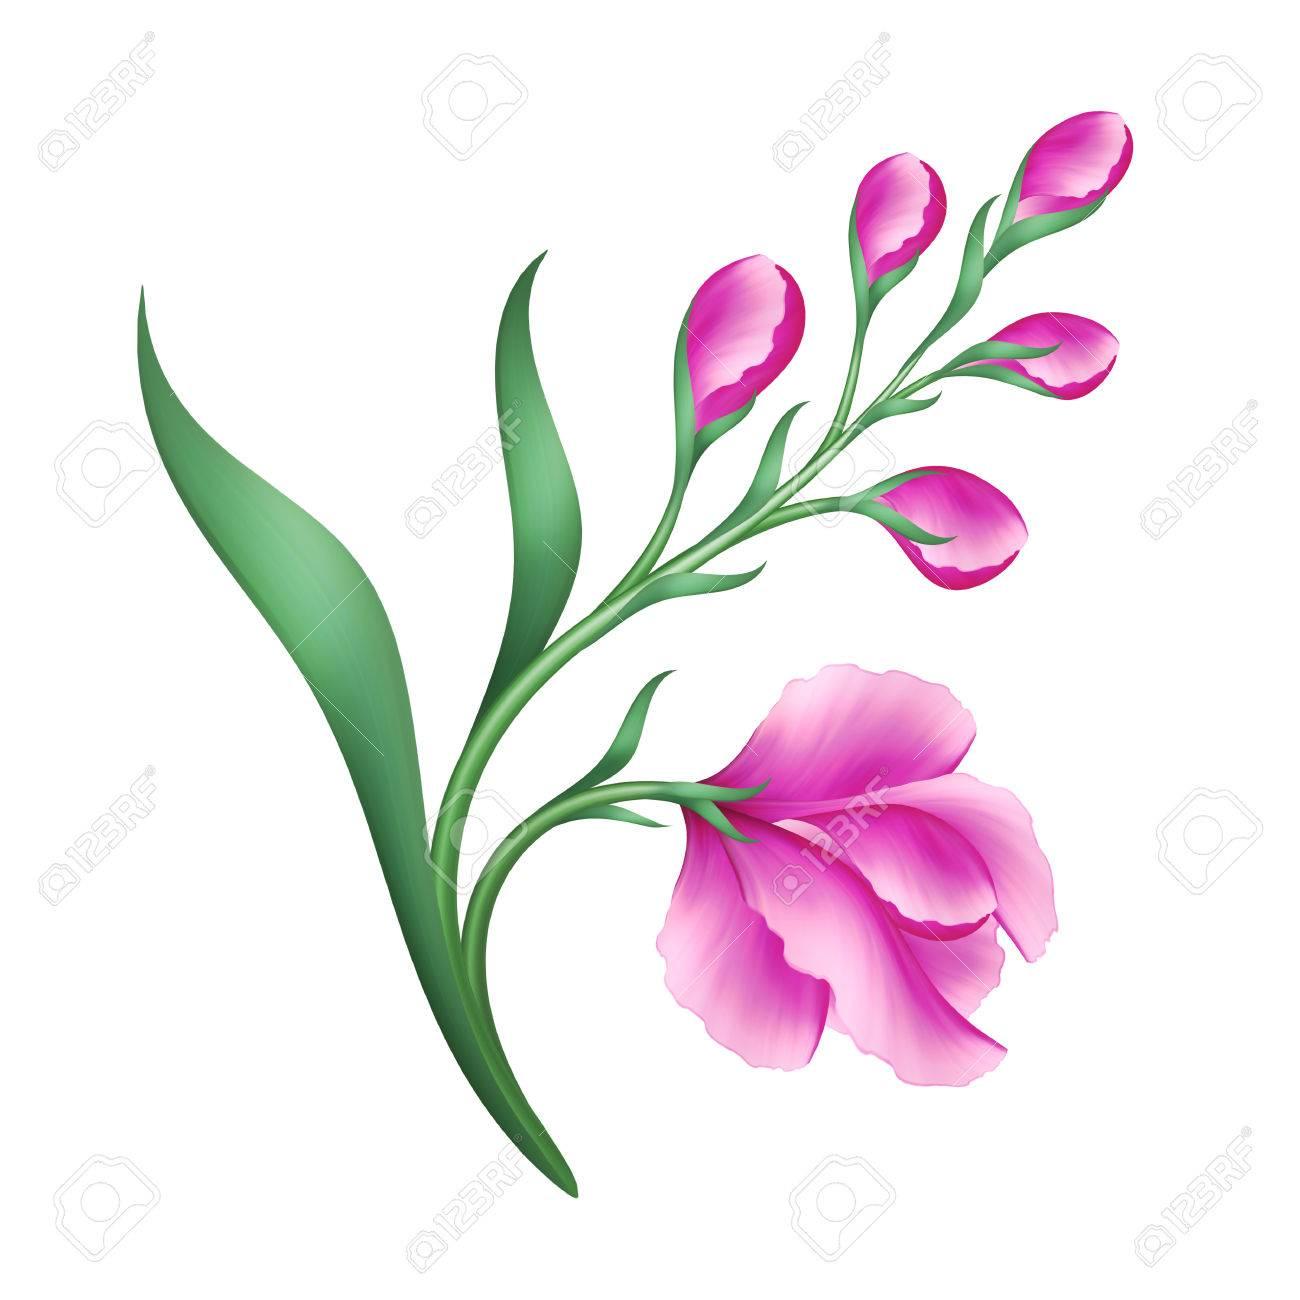 Digital illustration pink flowers design element isolated on white digital illustration pink flowers design element isolated on white background stok fotoraf 60195215 mightylinksfo